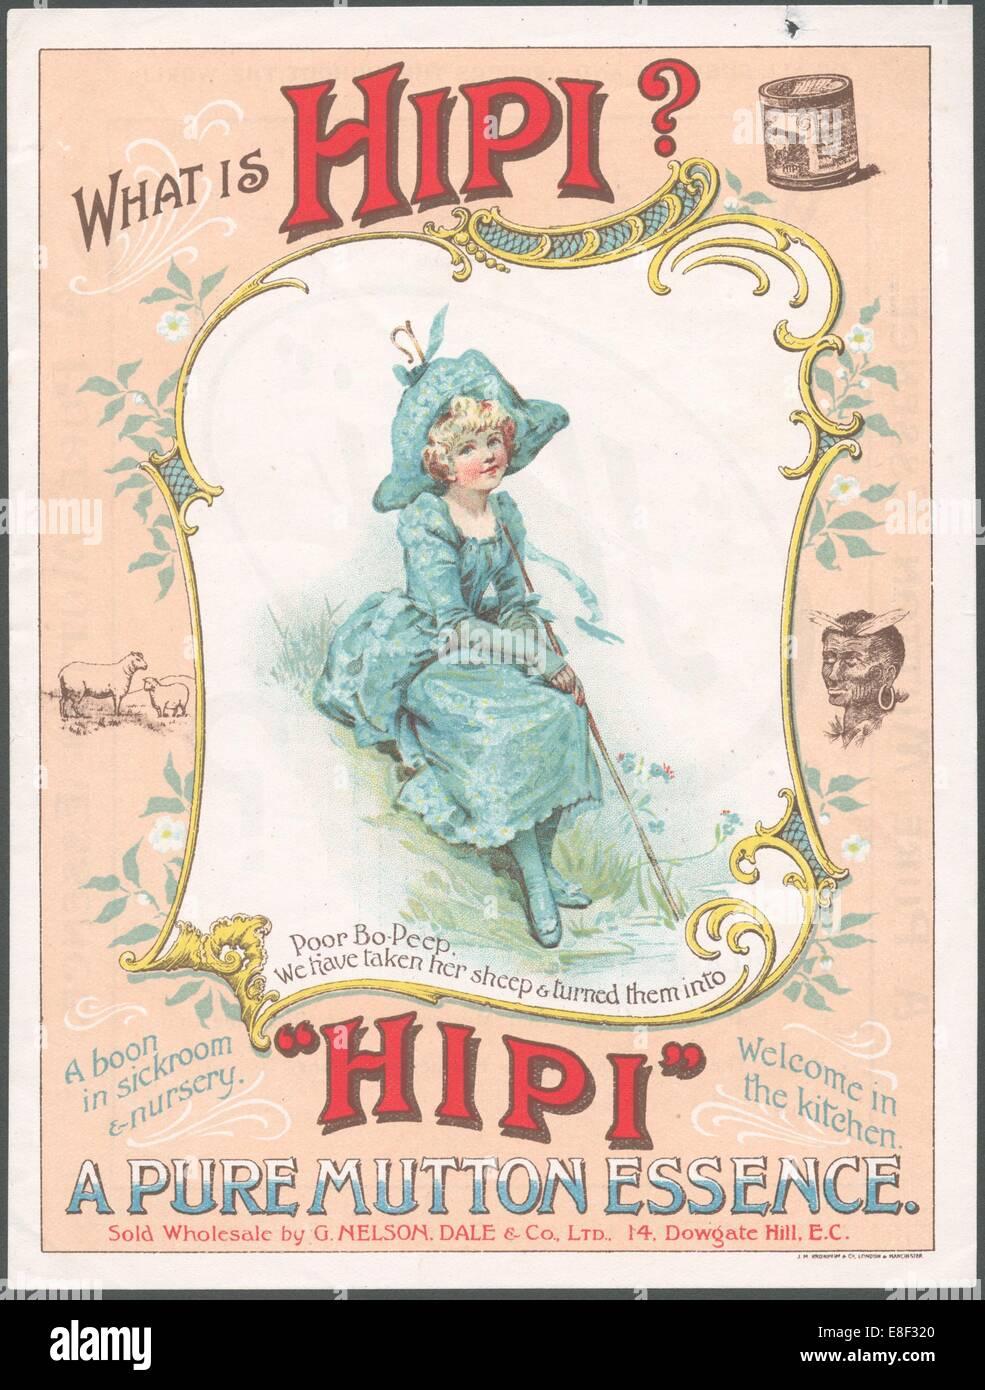 HIPI Hammel Essenz, 1880 s. Stockbild